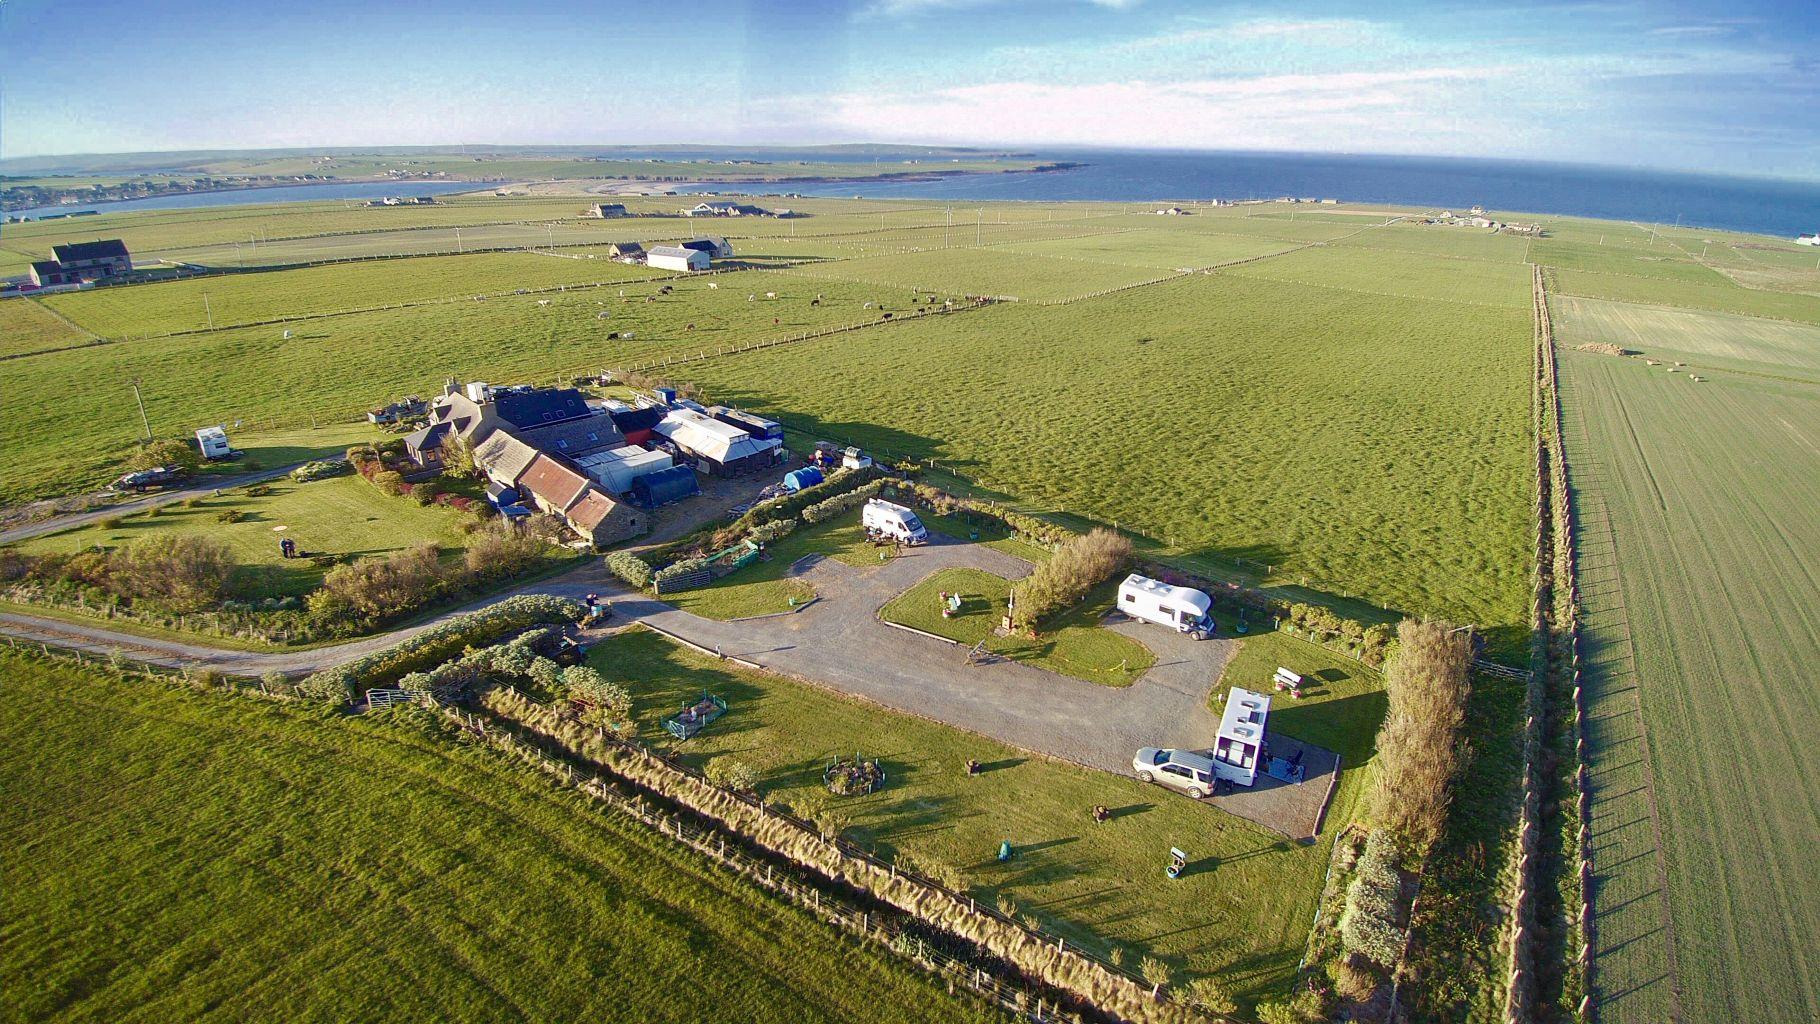 Location: Pool Farmhouse Orkney CL